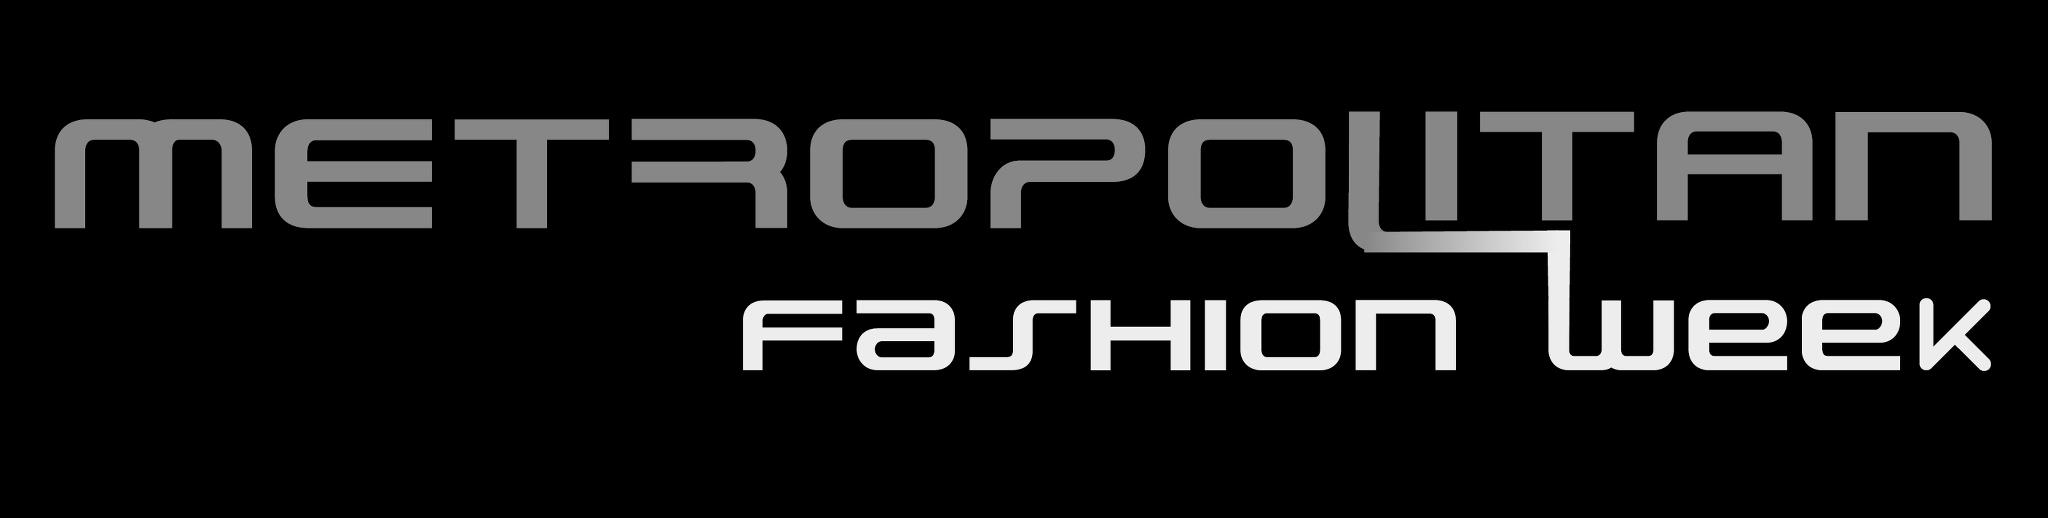 Metropolitan Fashion Week Sponsors Providence O'Christmas Tree